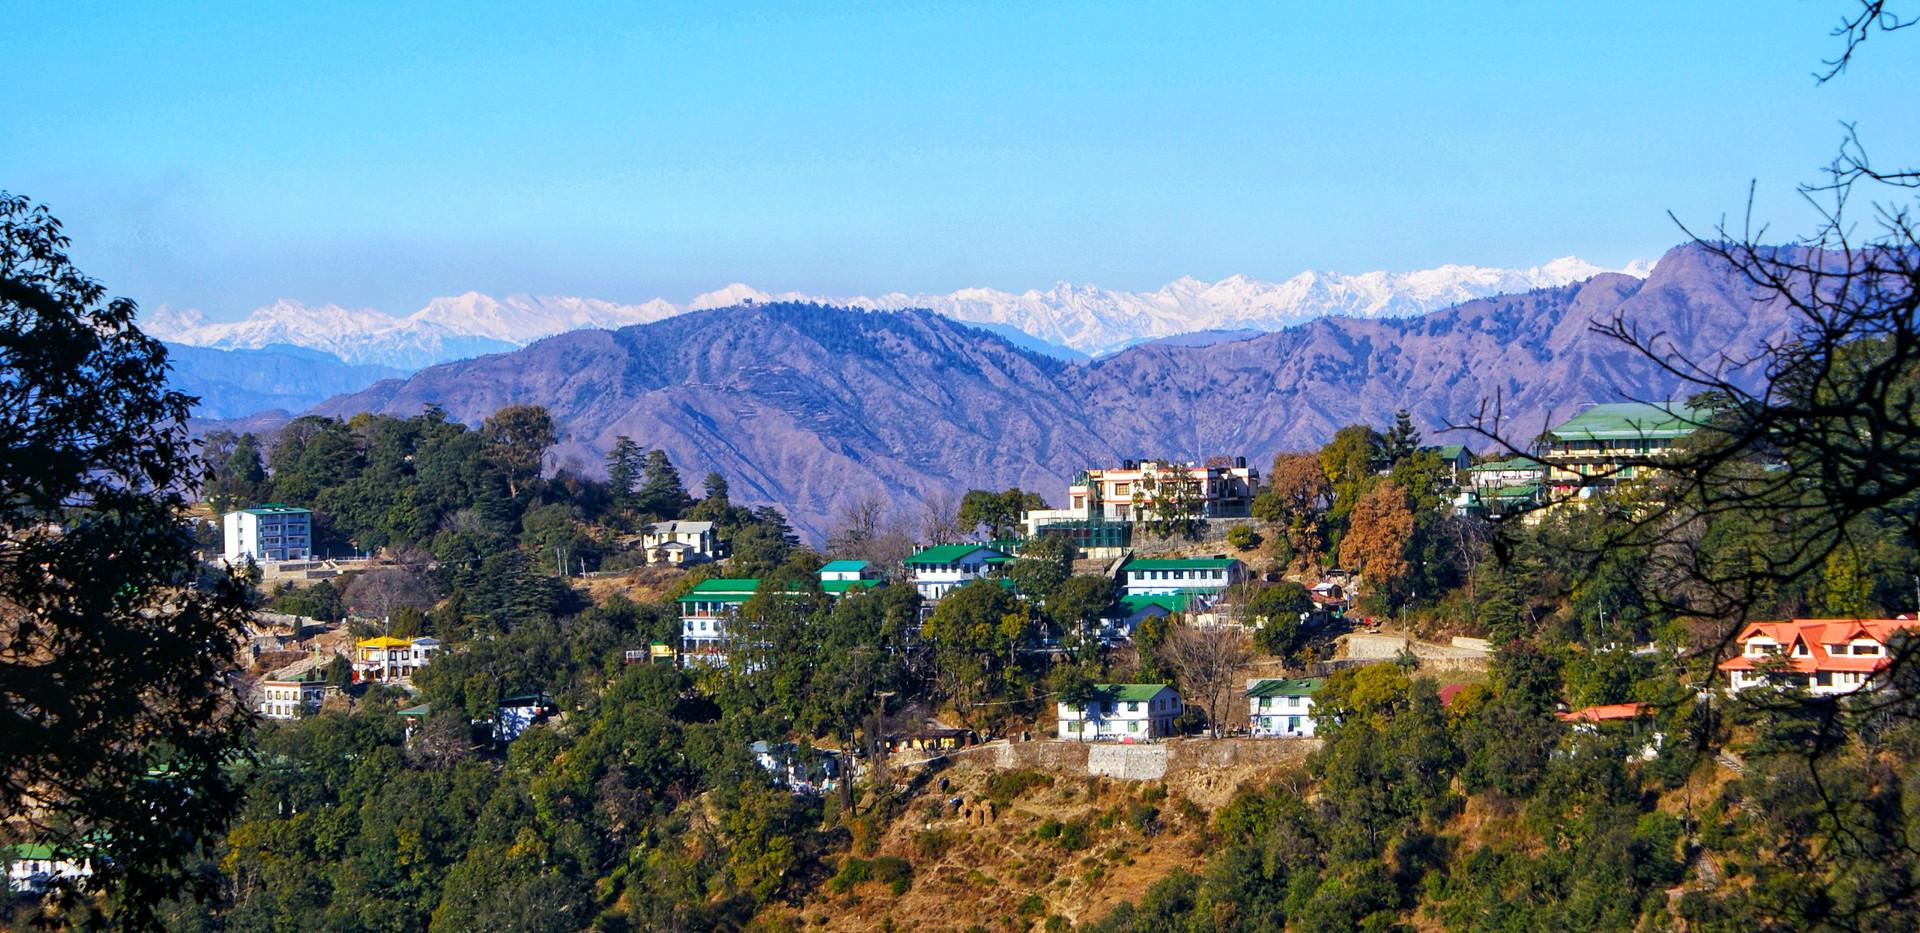 snowlion hills india.jpg